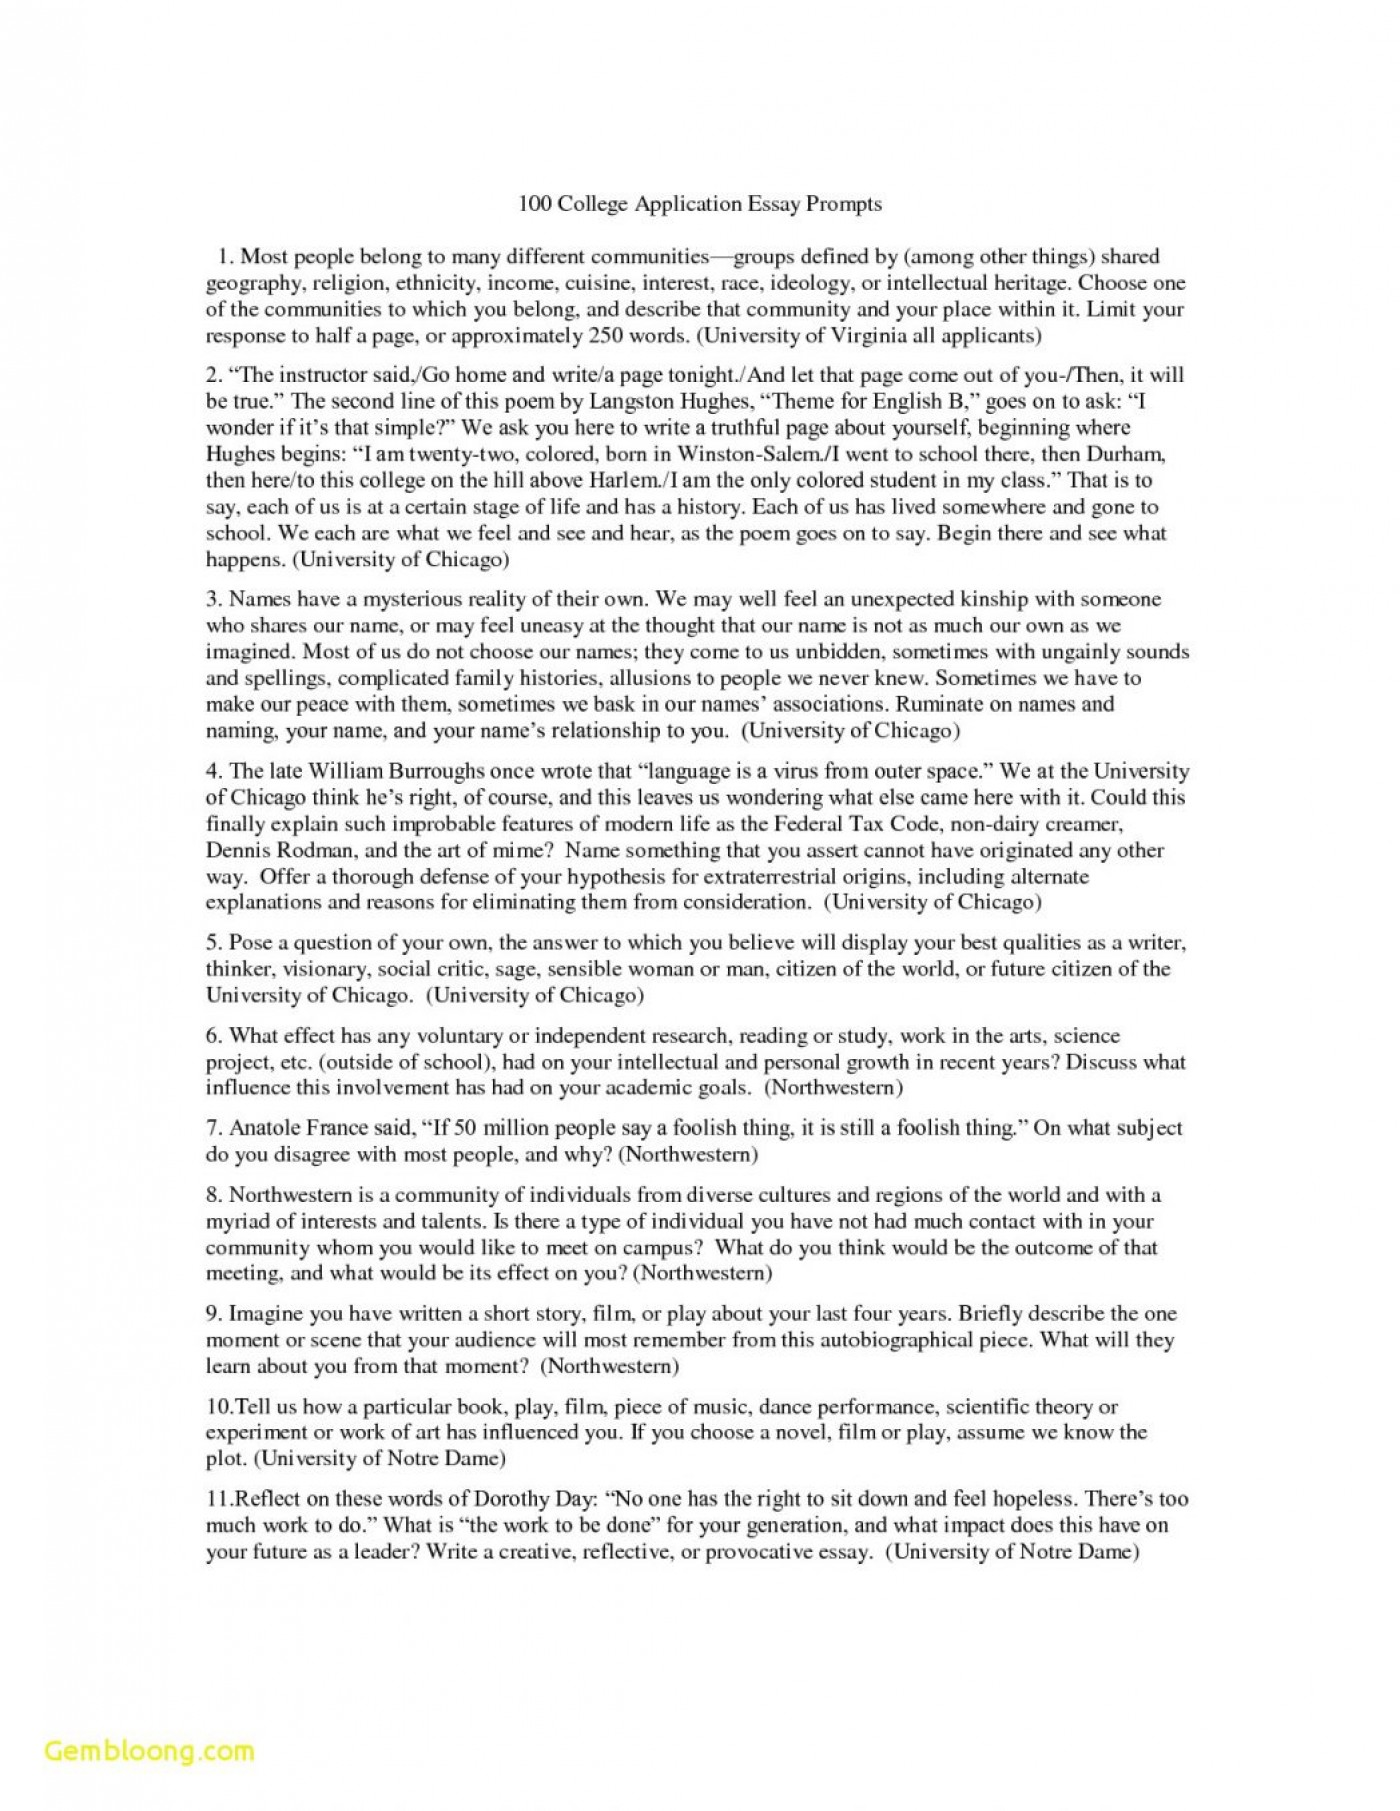 Extended essay minimum words